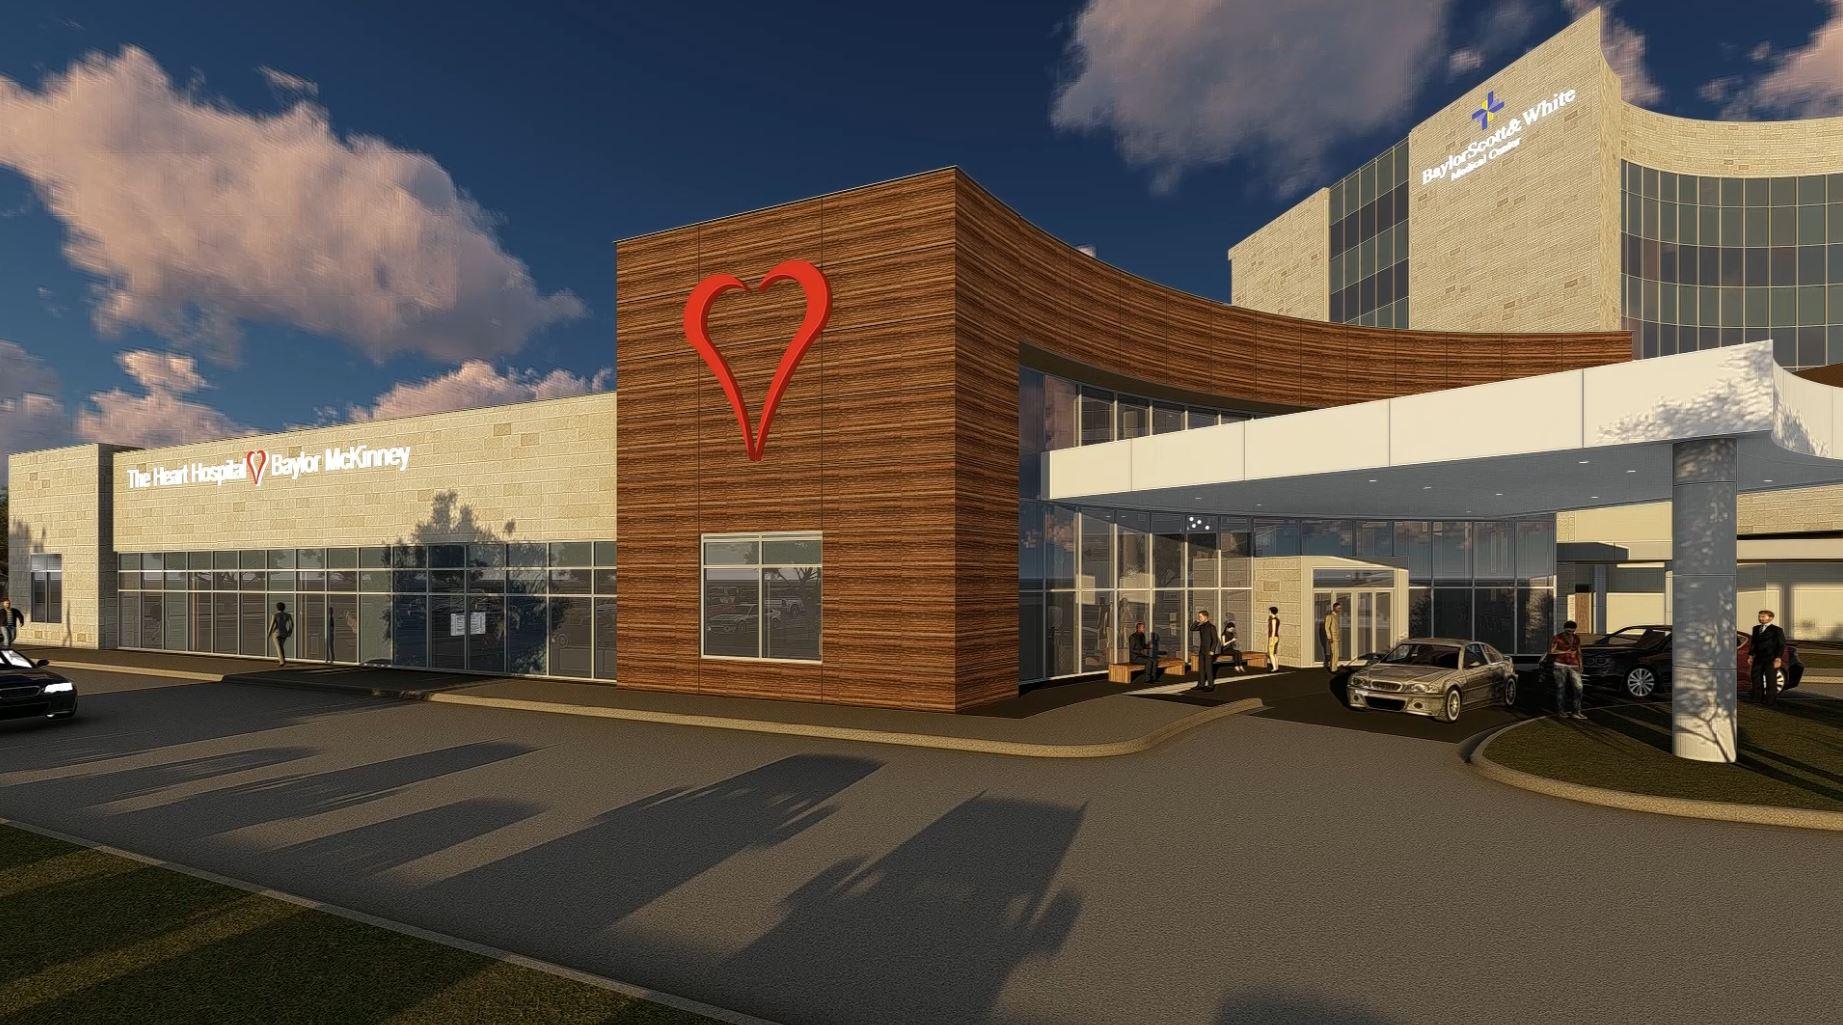 FIRST LOOK: The Heart Hospital Baylor McKinney